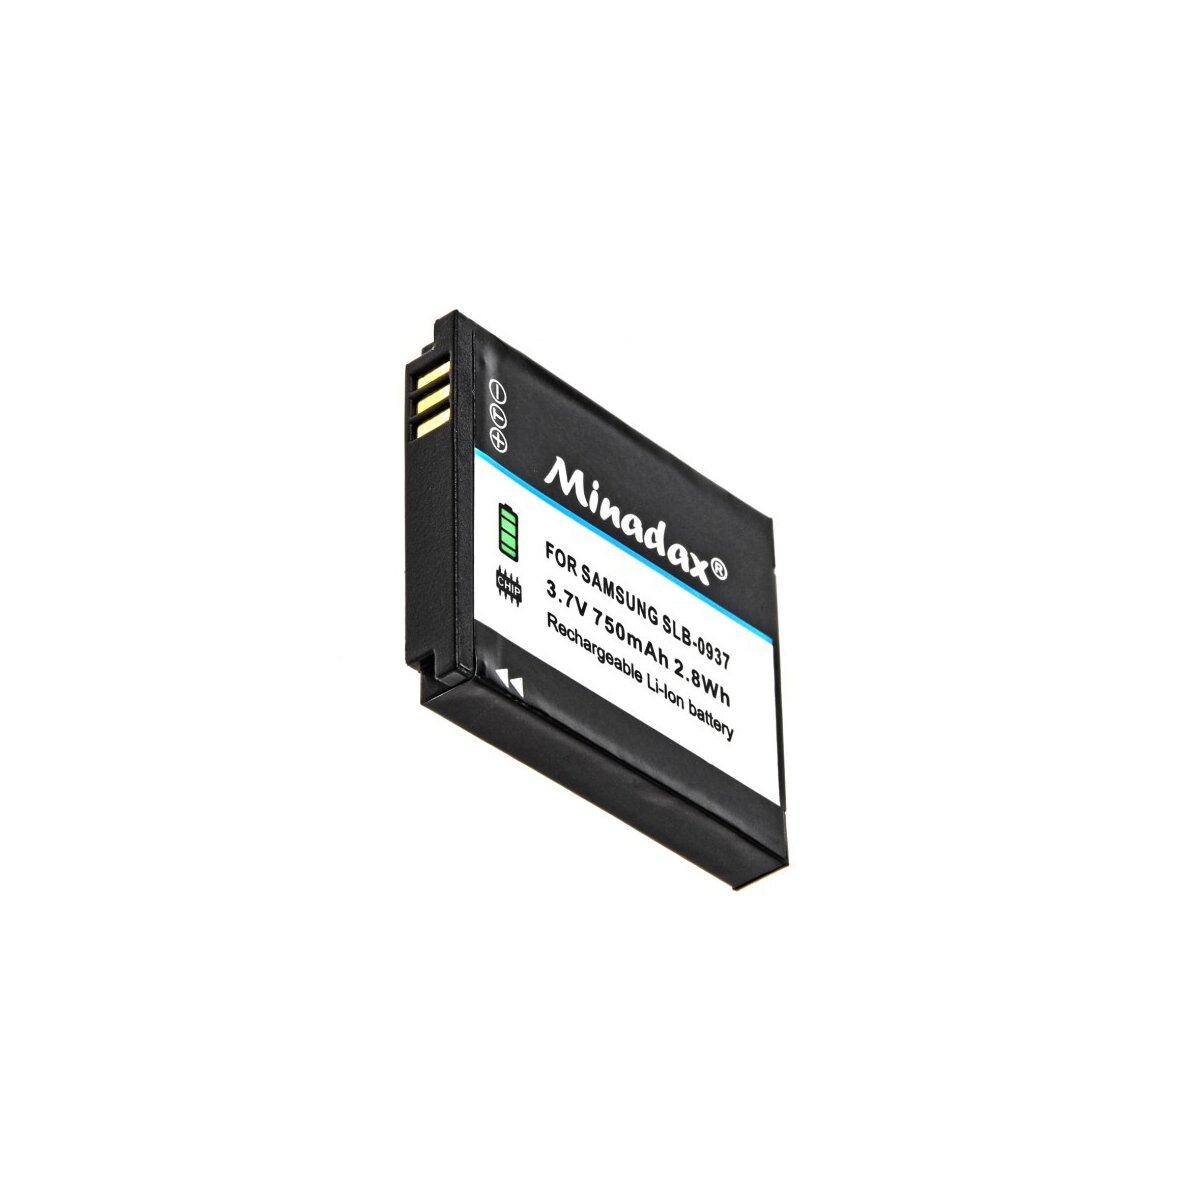 Minadax® Qualitaetsakku mit echten 750 mAh fuer Samsung Digimax L830, NV4, PL10, NV33, L730, CL5, i8, wie SLB-0937 - Intelligentes Akkusystem mit Chip